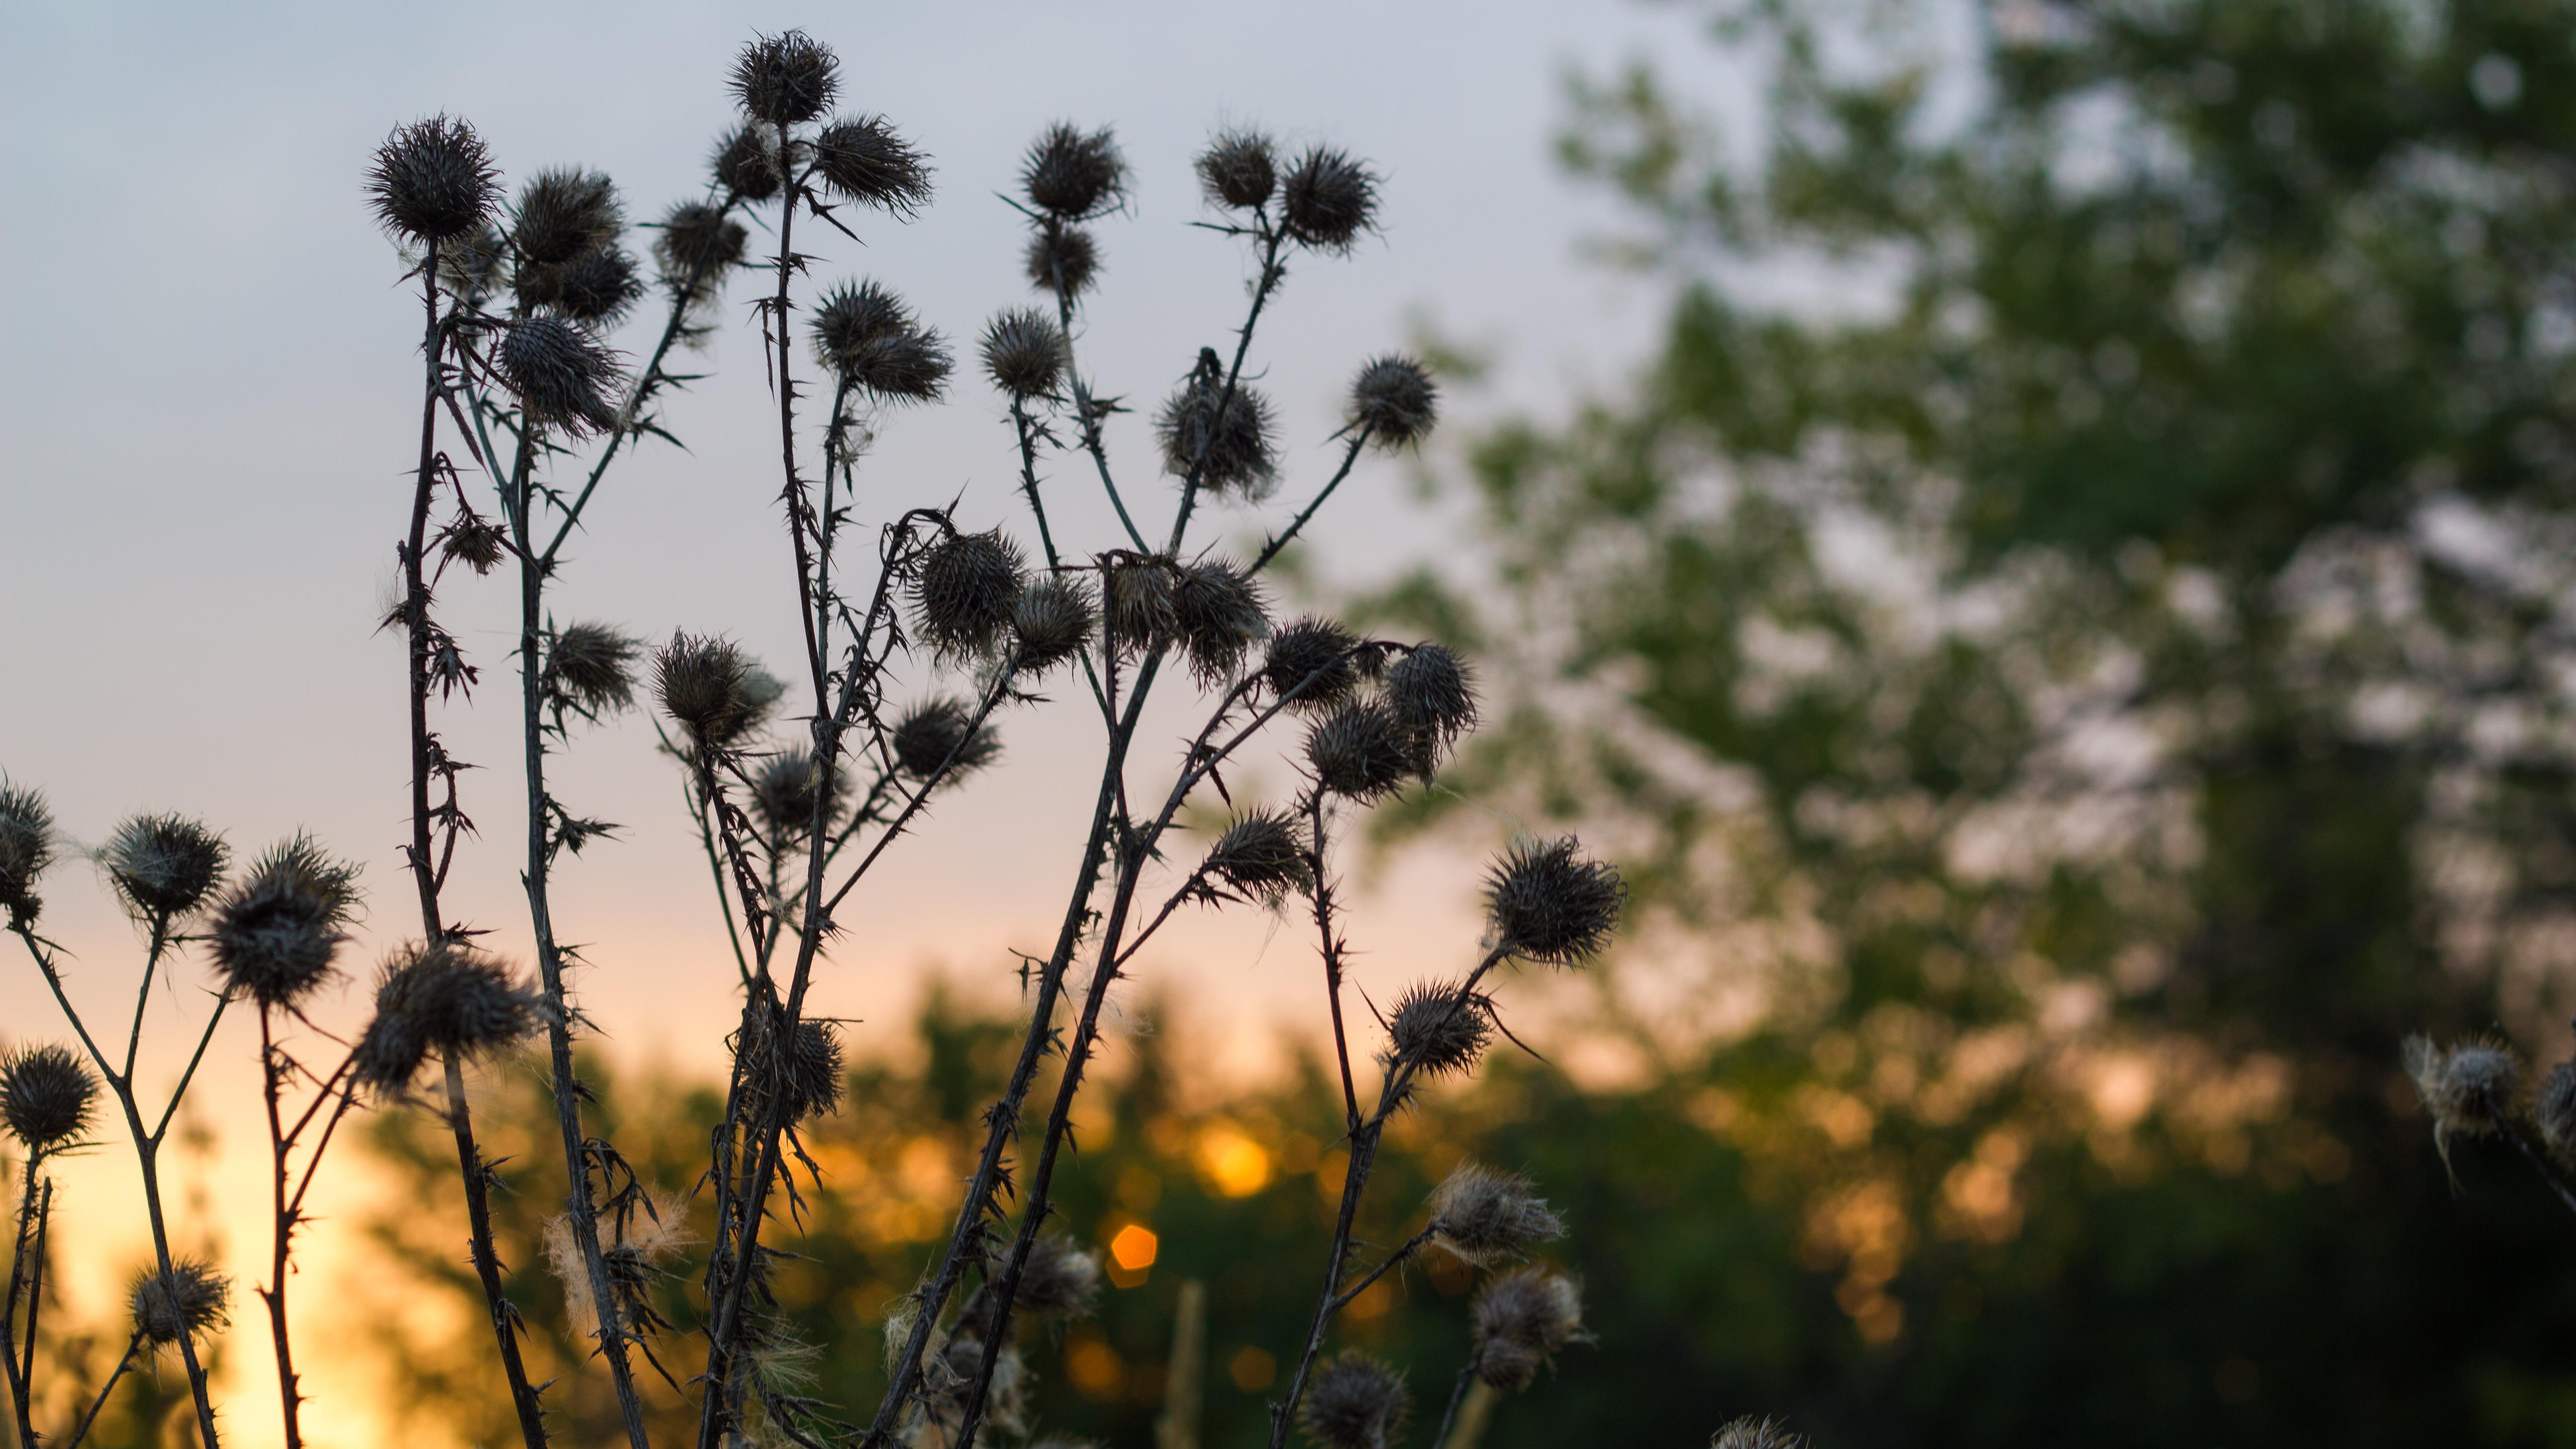 Flowers in Sunrise